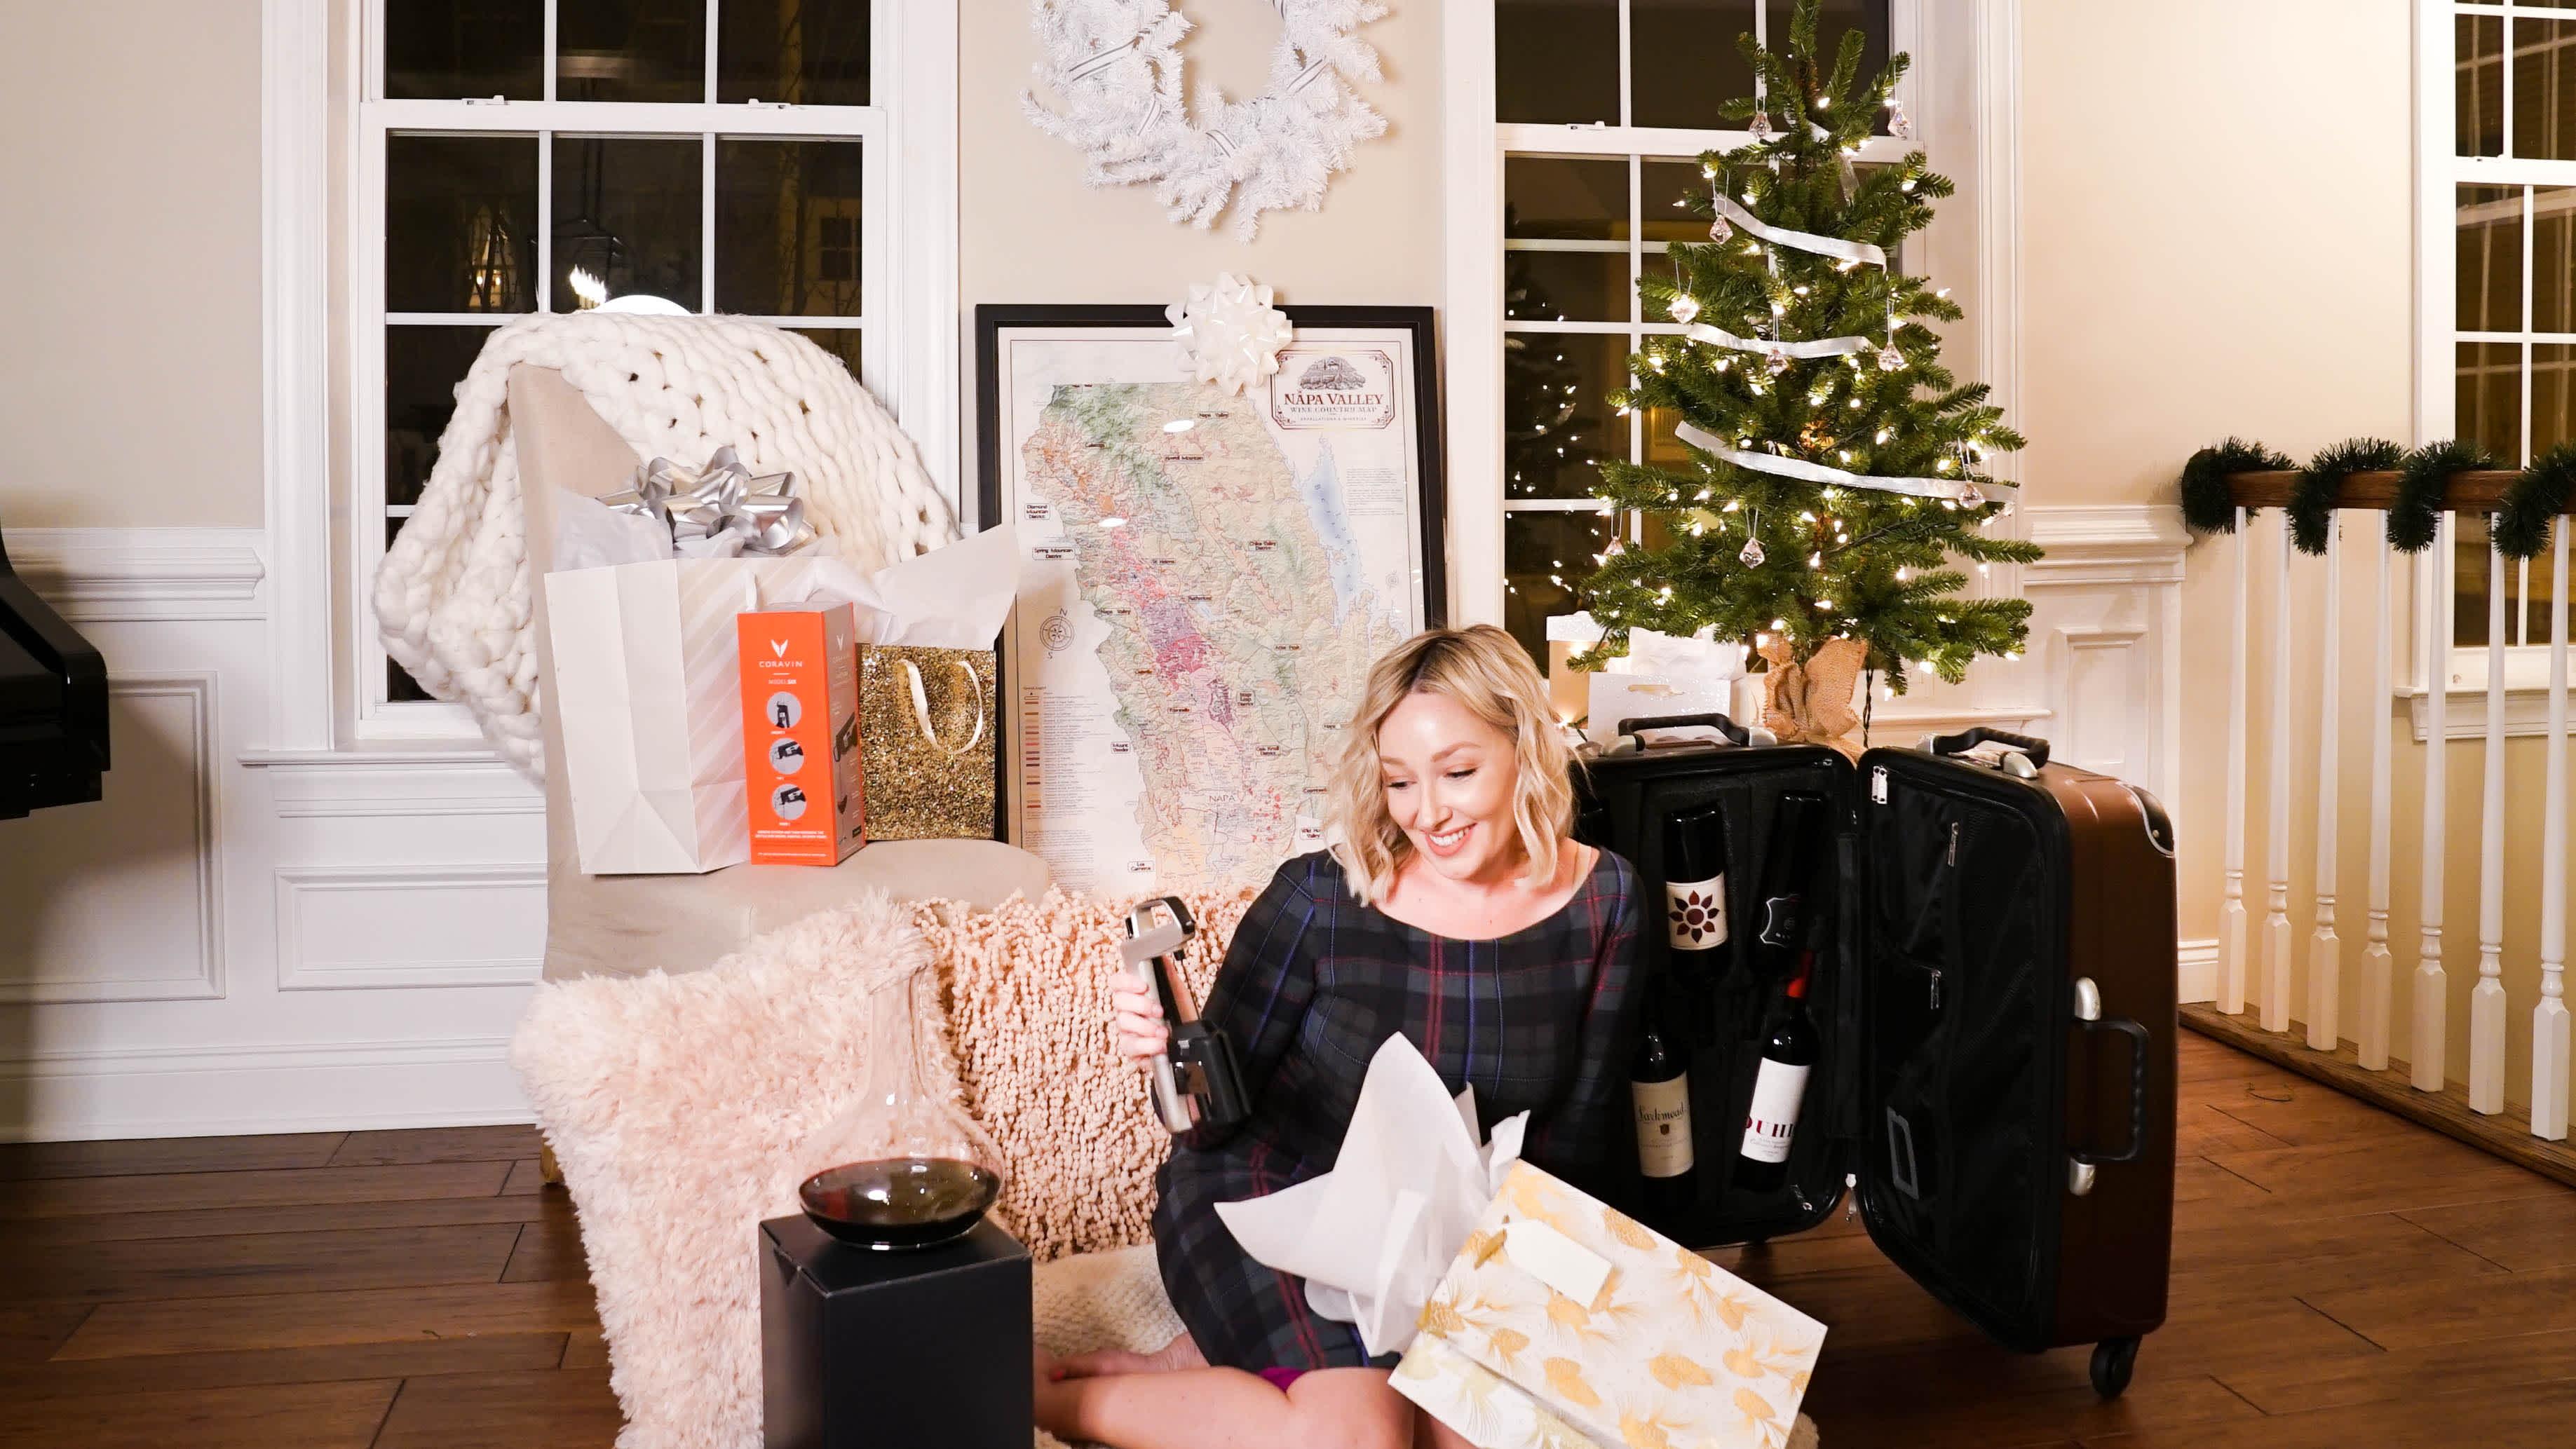 Amanda gift guide for wine geeks